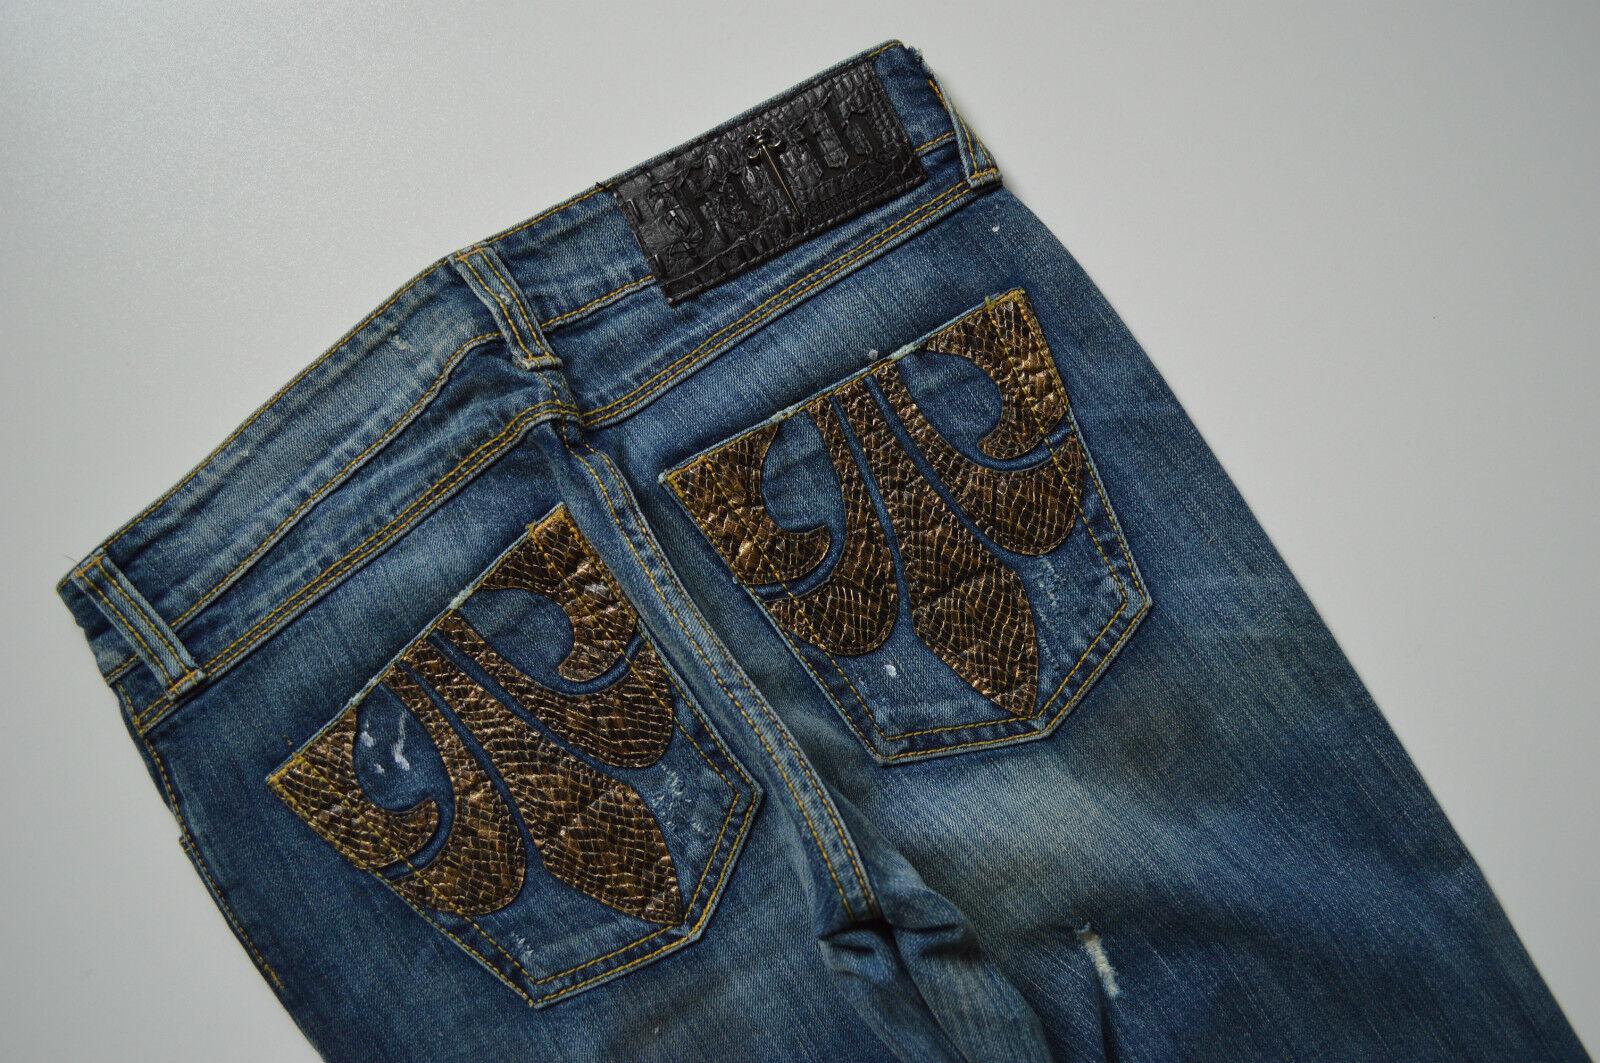 484 NEU FAITH Damen Designer Hüft Jeans Hose FAITH JEAN MAJESTY GRUNGE W26 L34